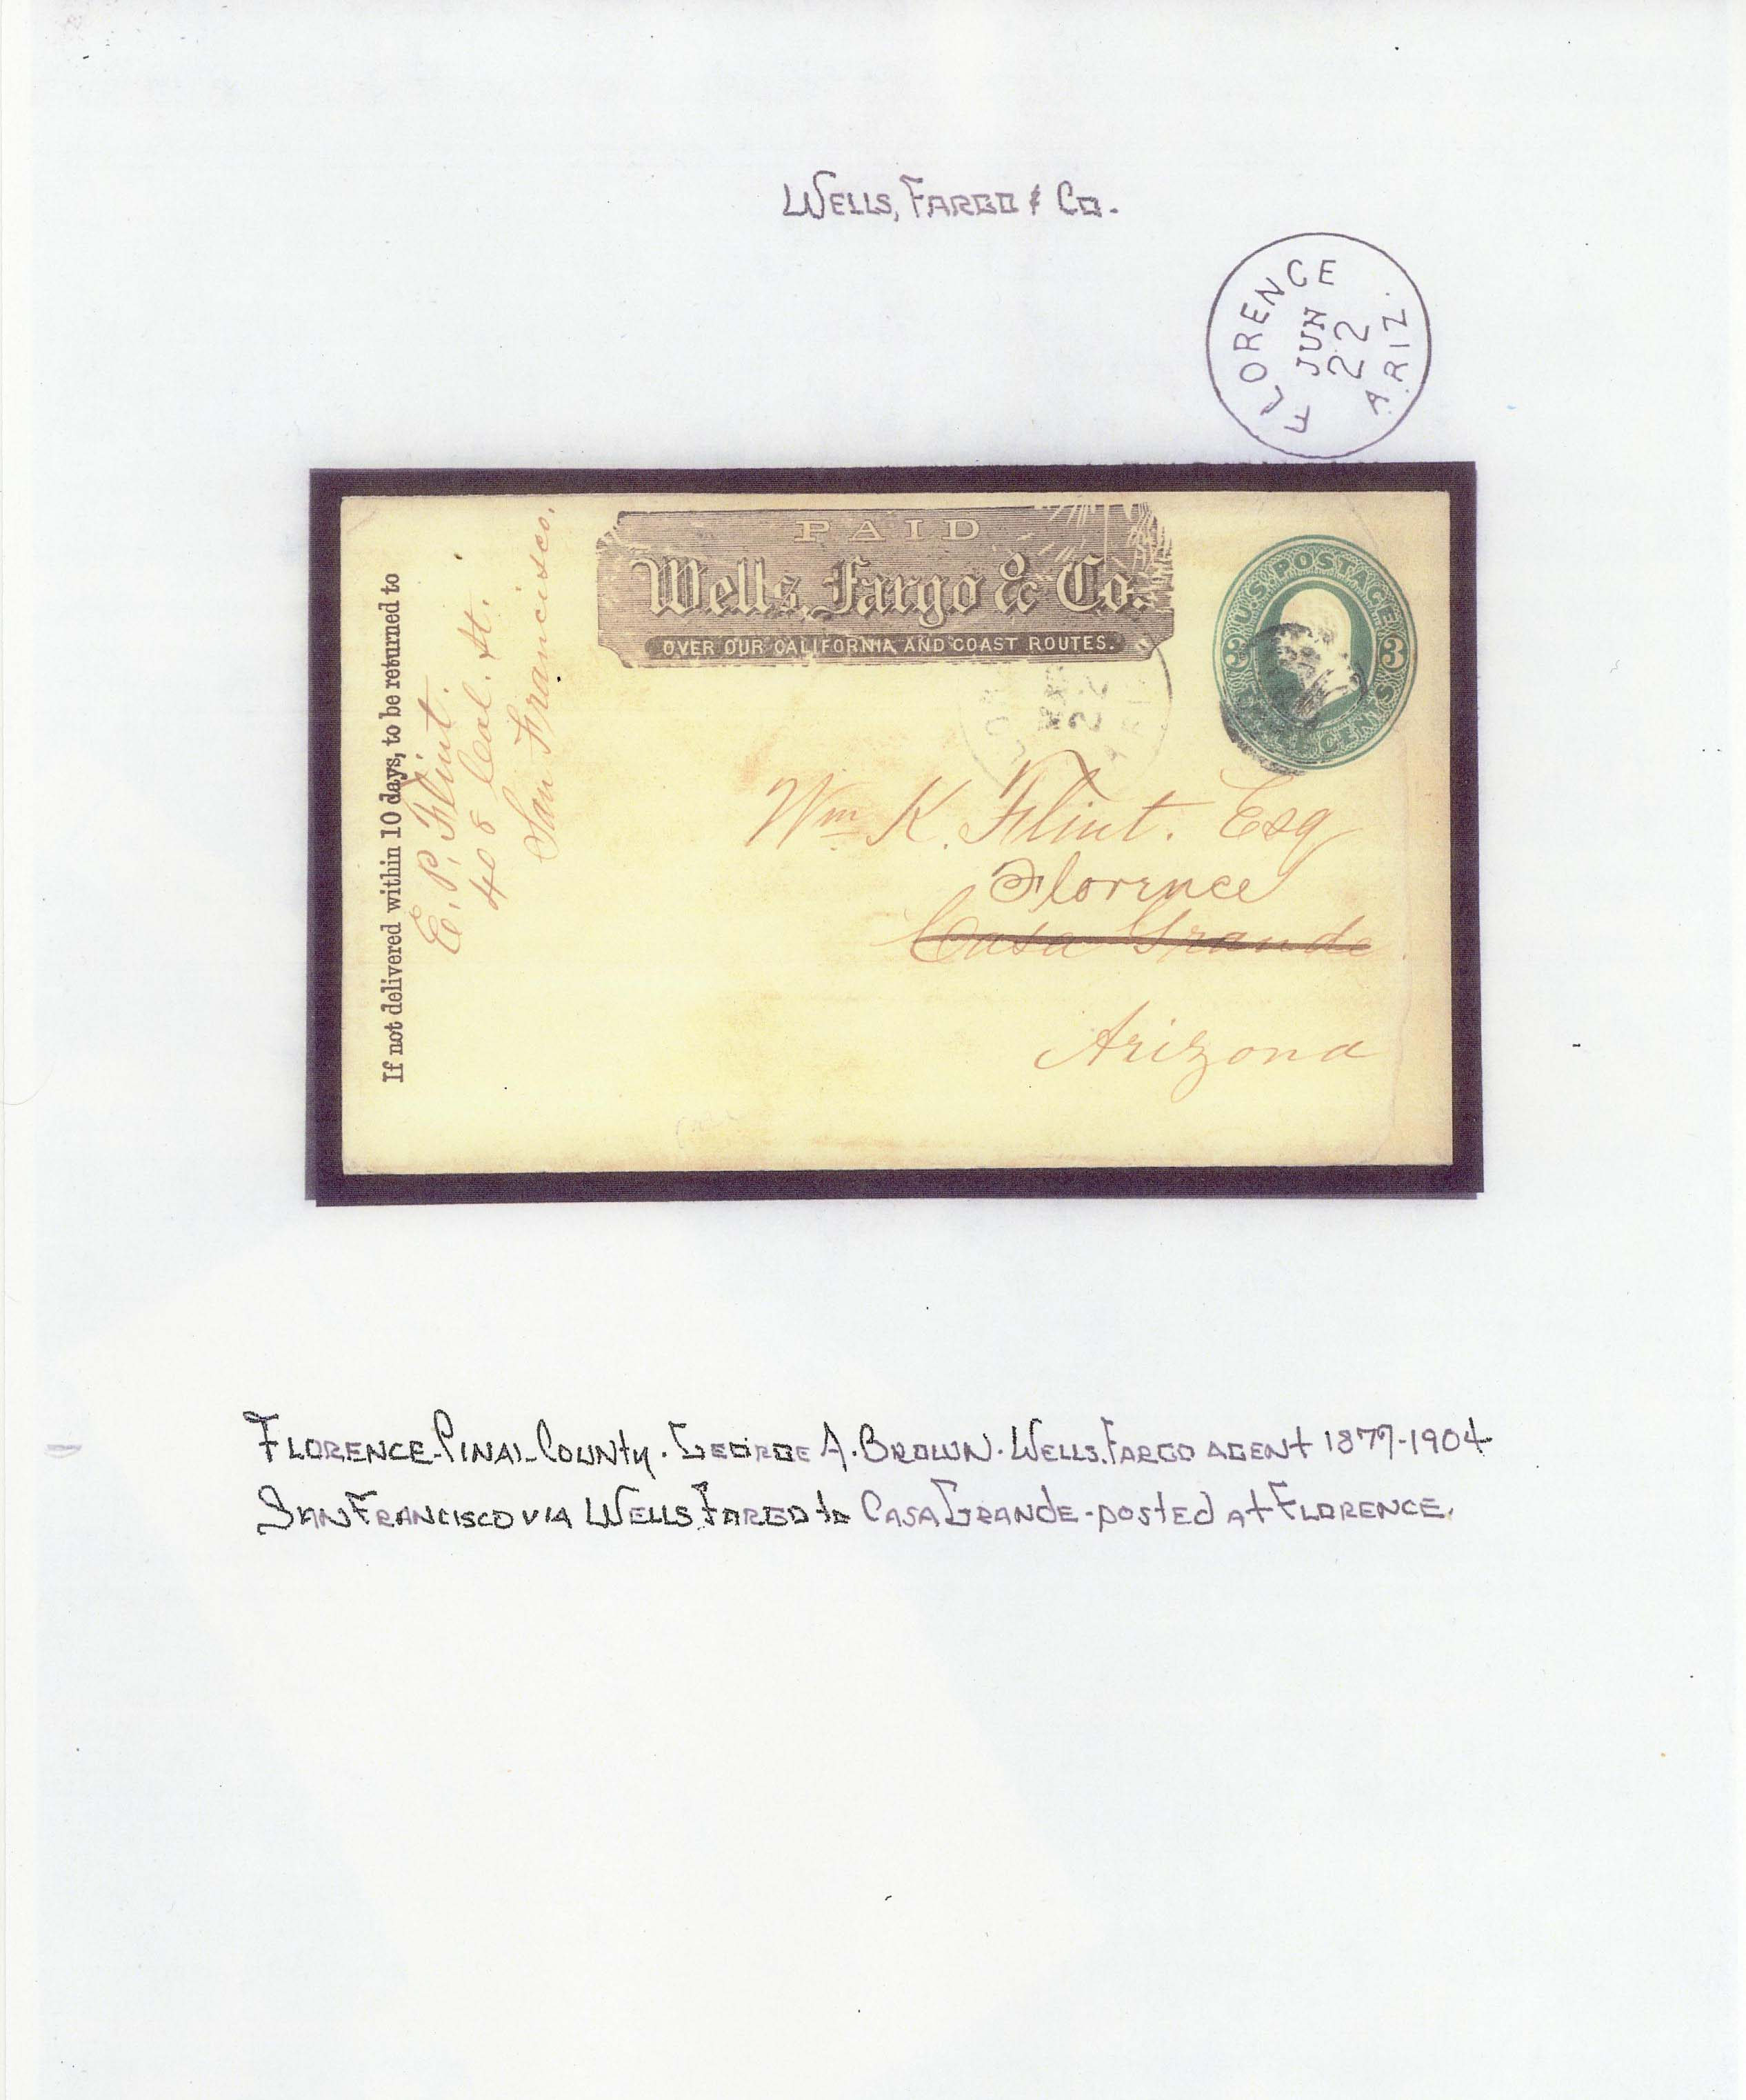 WF Florence Mar22 80